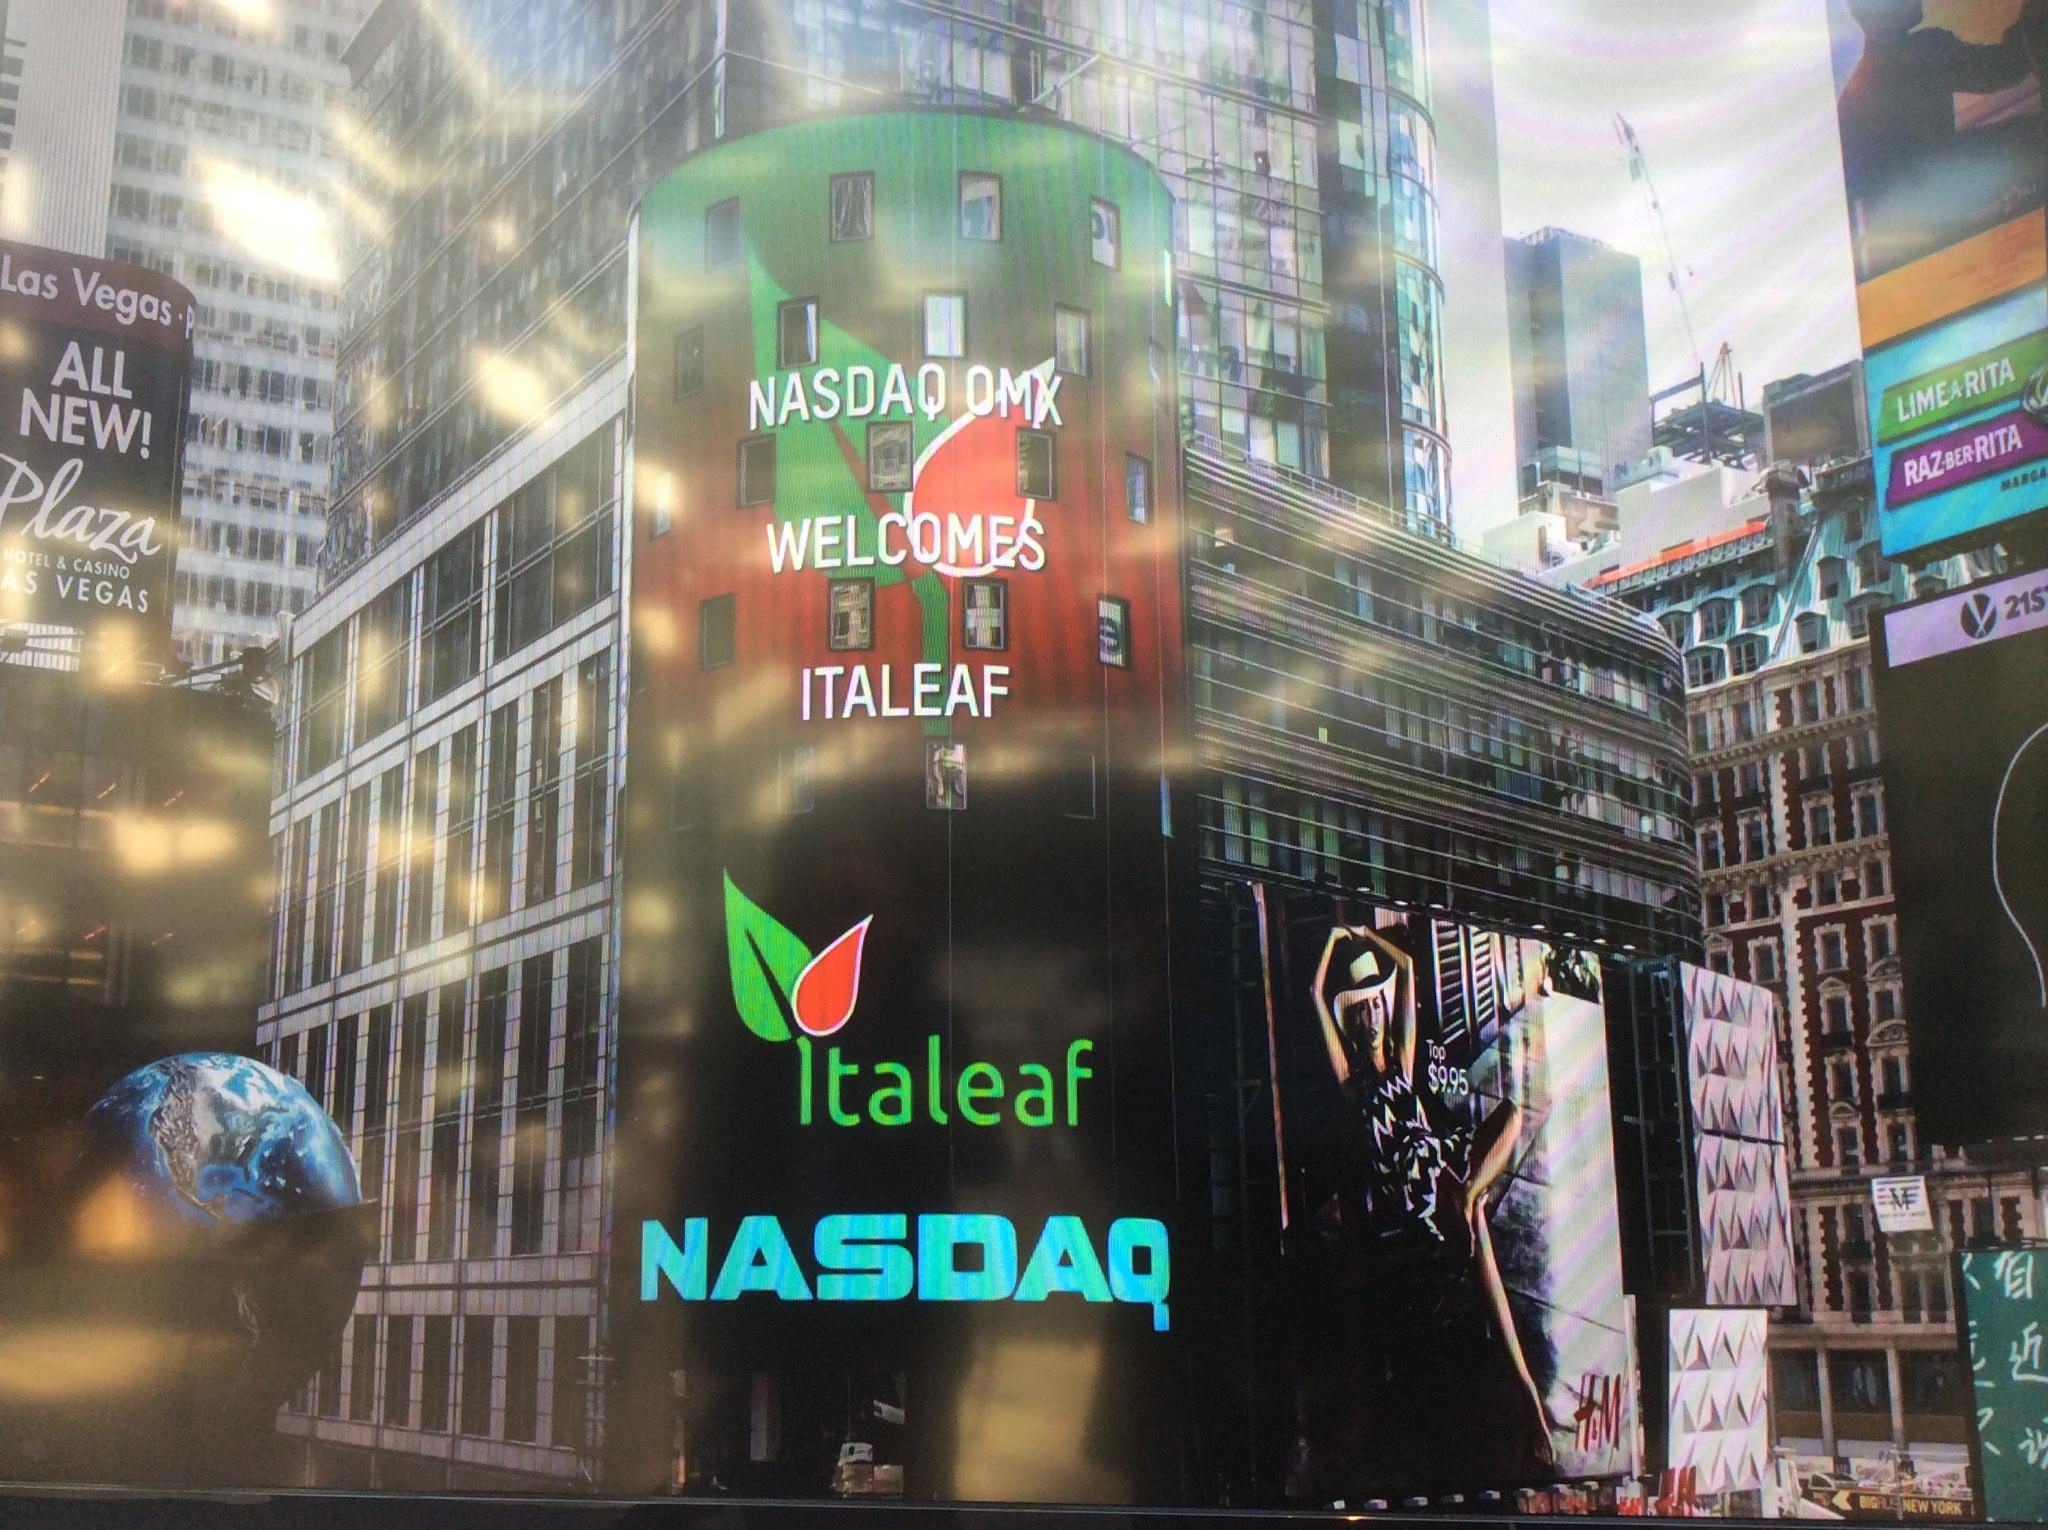 Calendario Nasdaq.Italeaf Group Innovation To Make The Change Italeaf